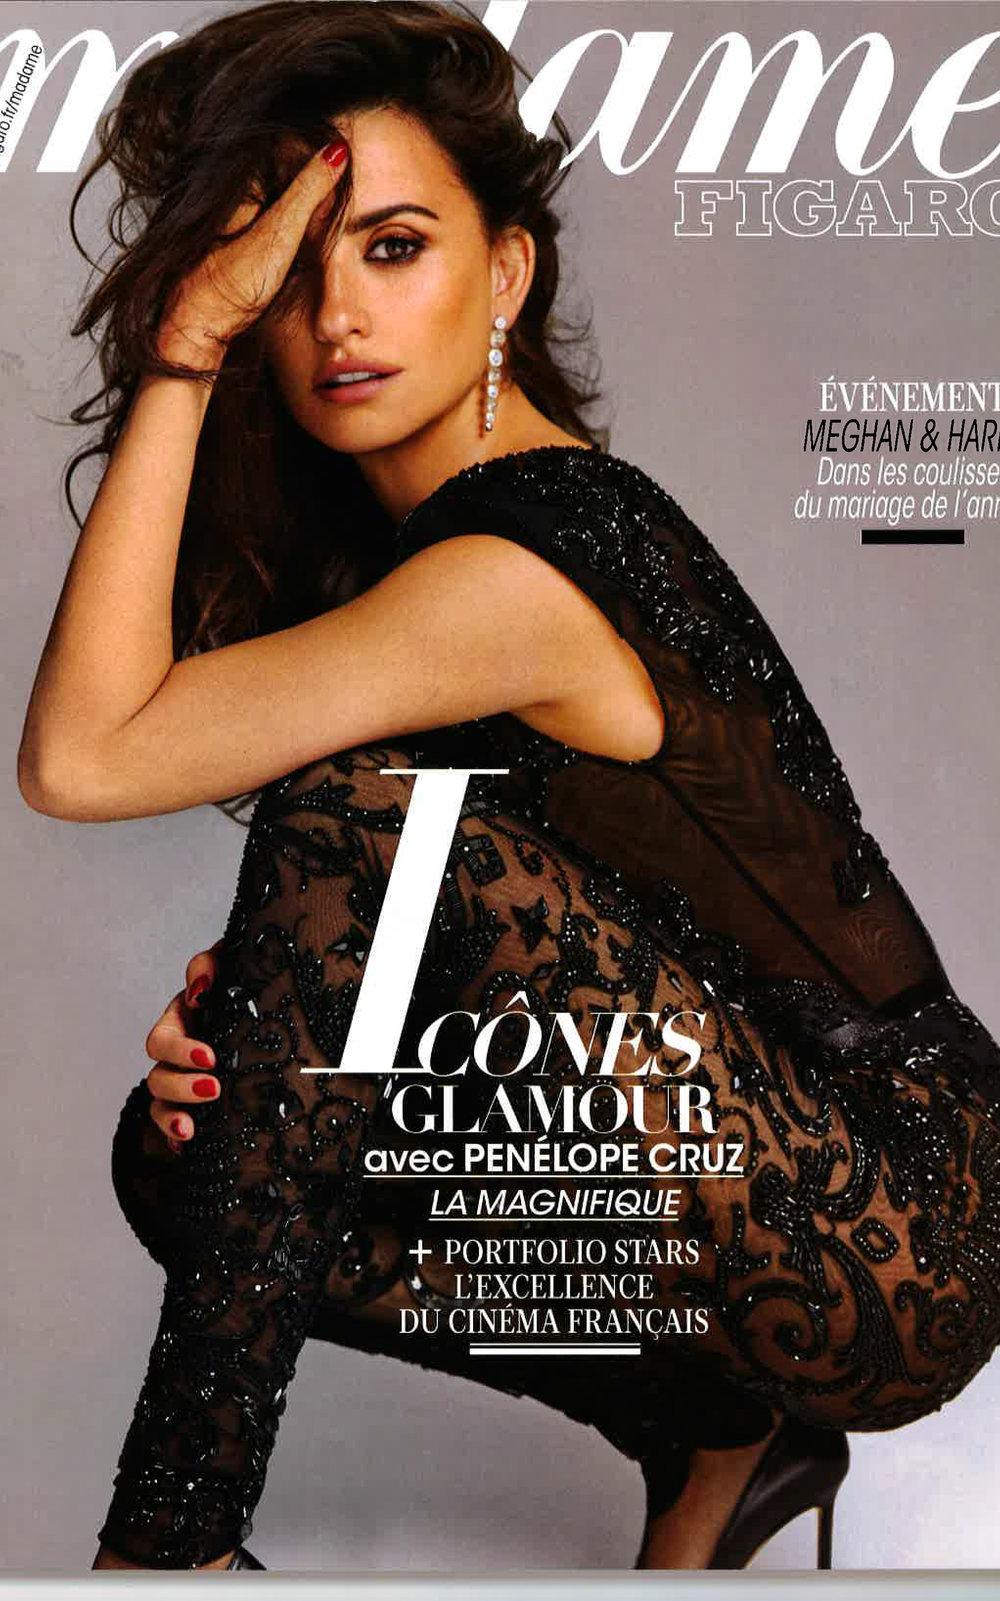 Couverture Madame Figaro Mai 2018.jpg